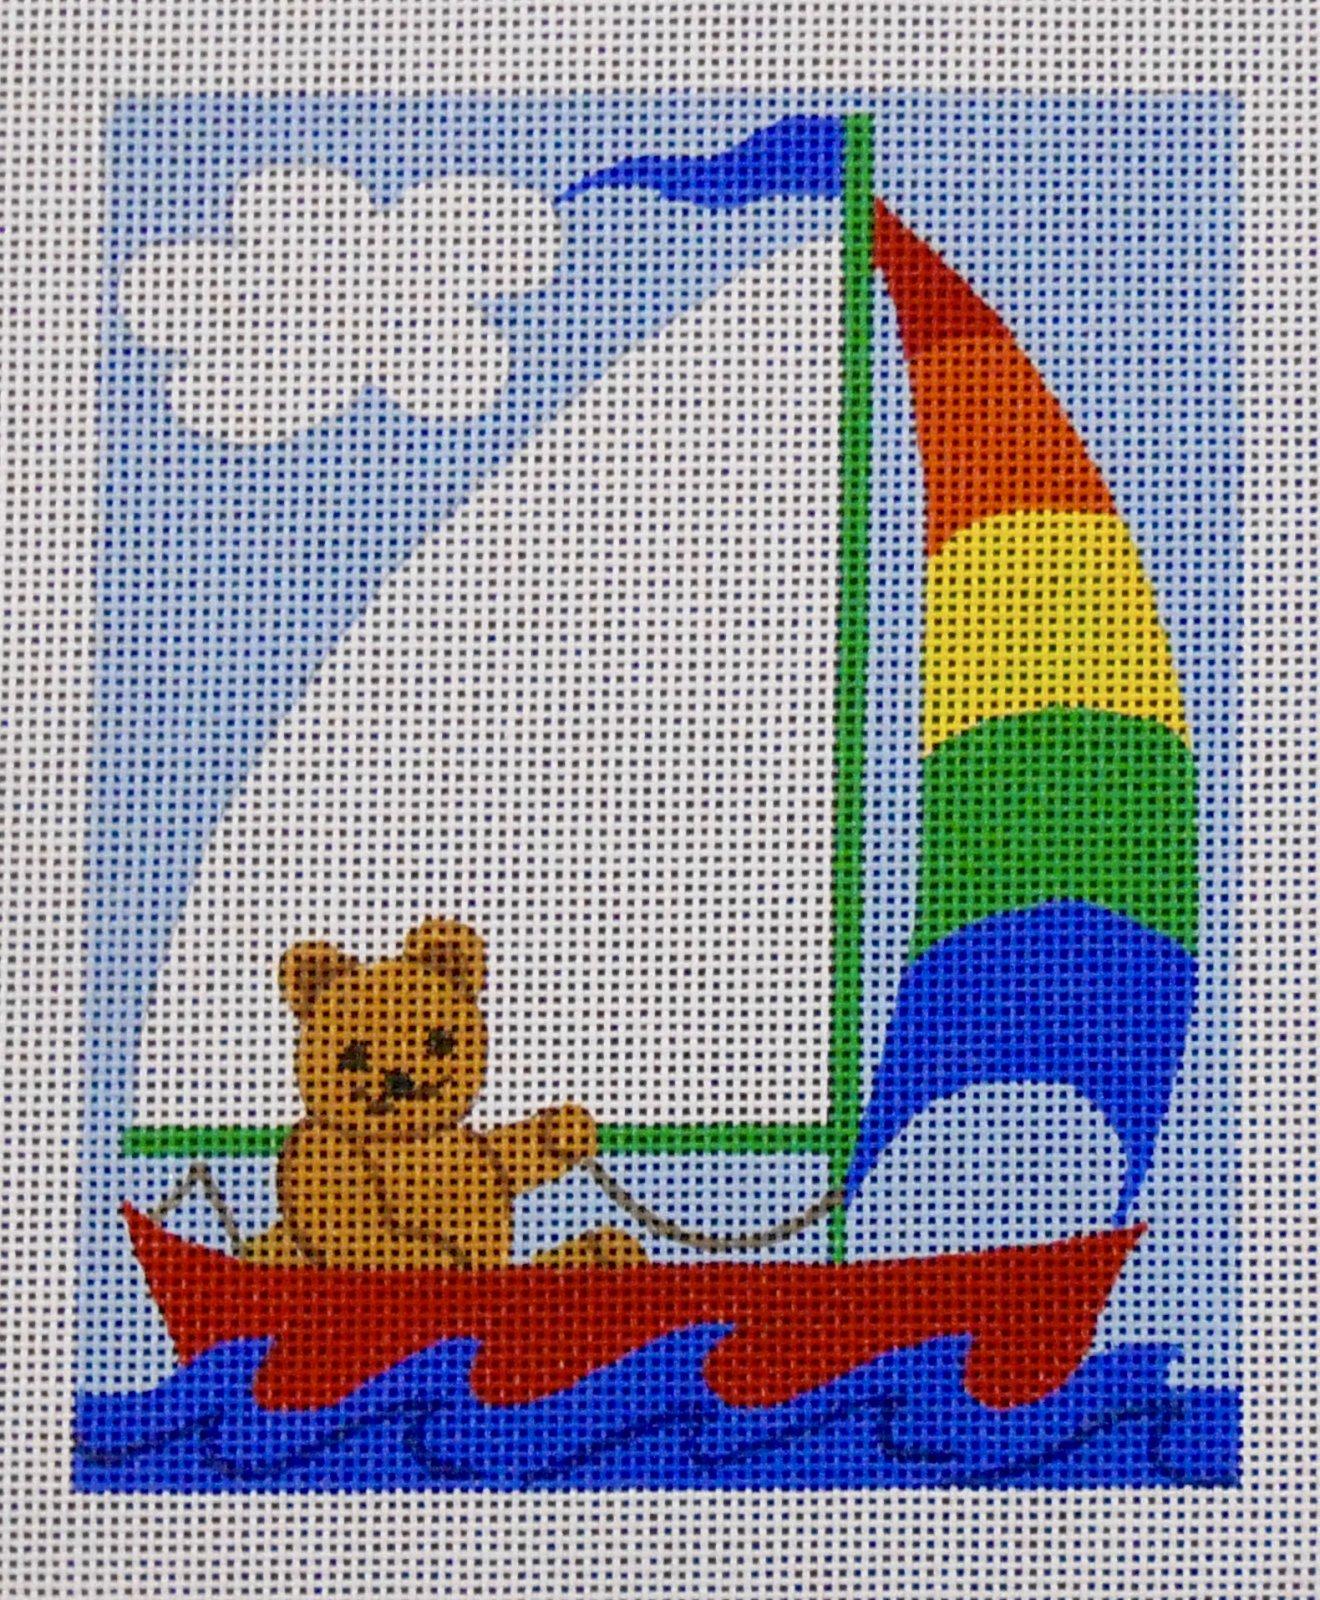 Boat with Teddy Bear